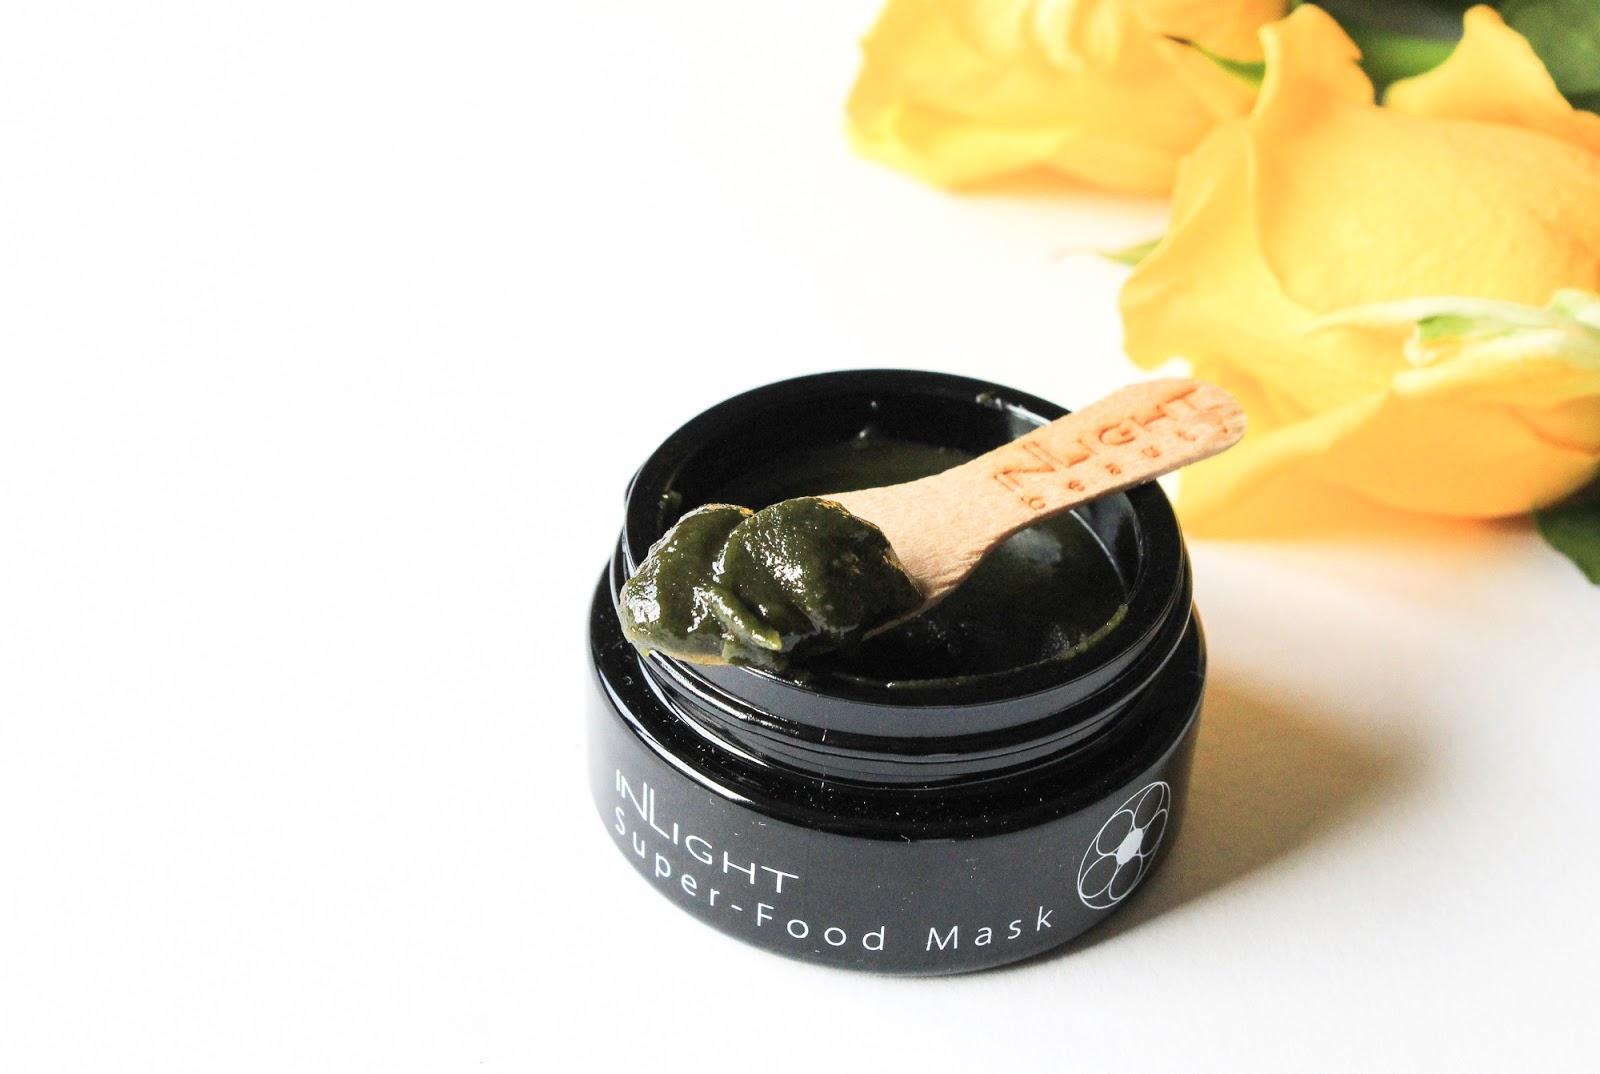 Beauty Discovery Beauty Heroes November 2018 Inlight Beauty Super-Food Mask consistency